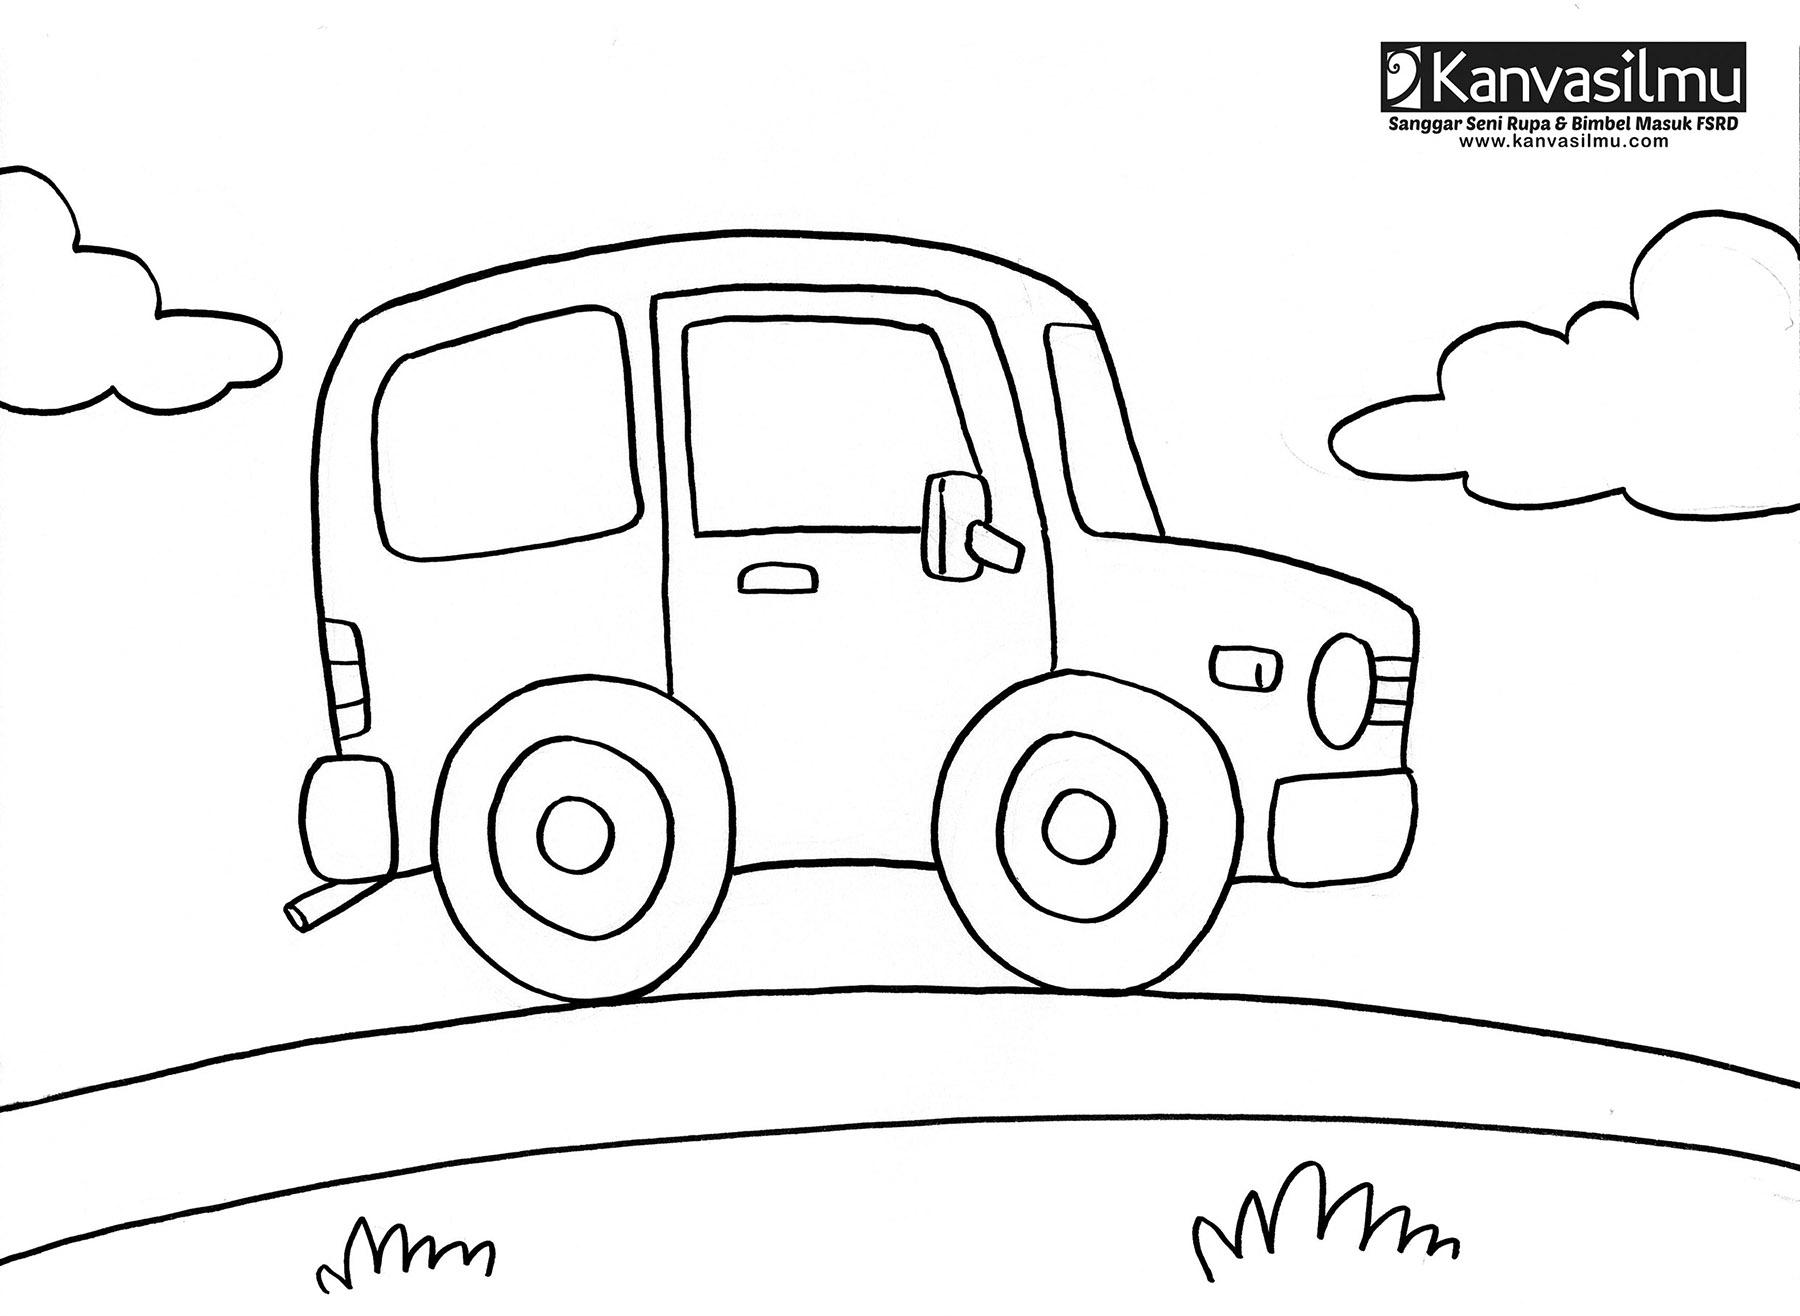 Lembar Mewarnai Mobil 1 Kanvasilmu